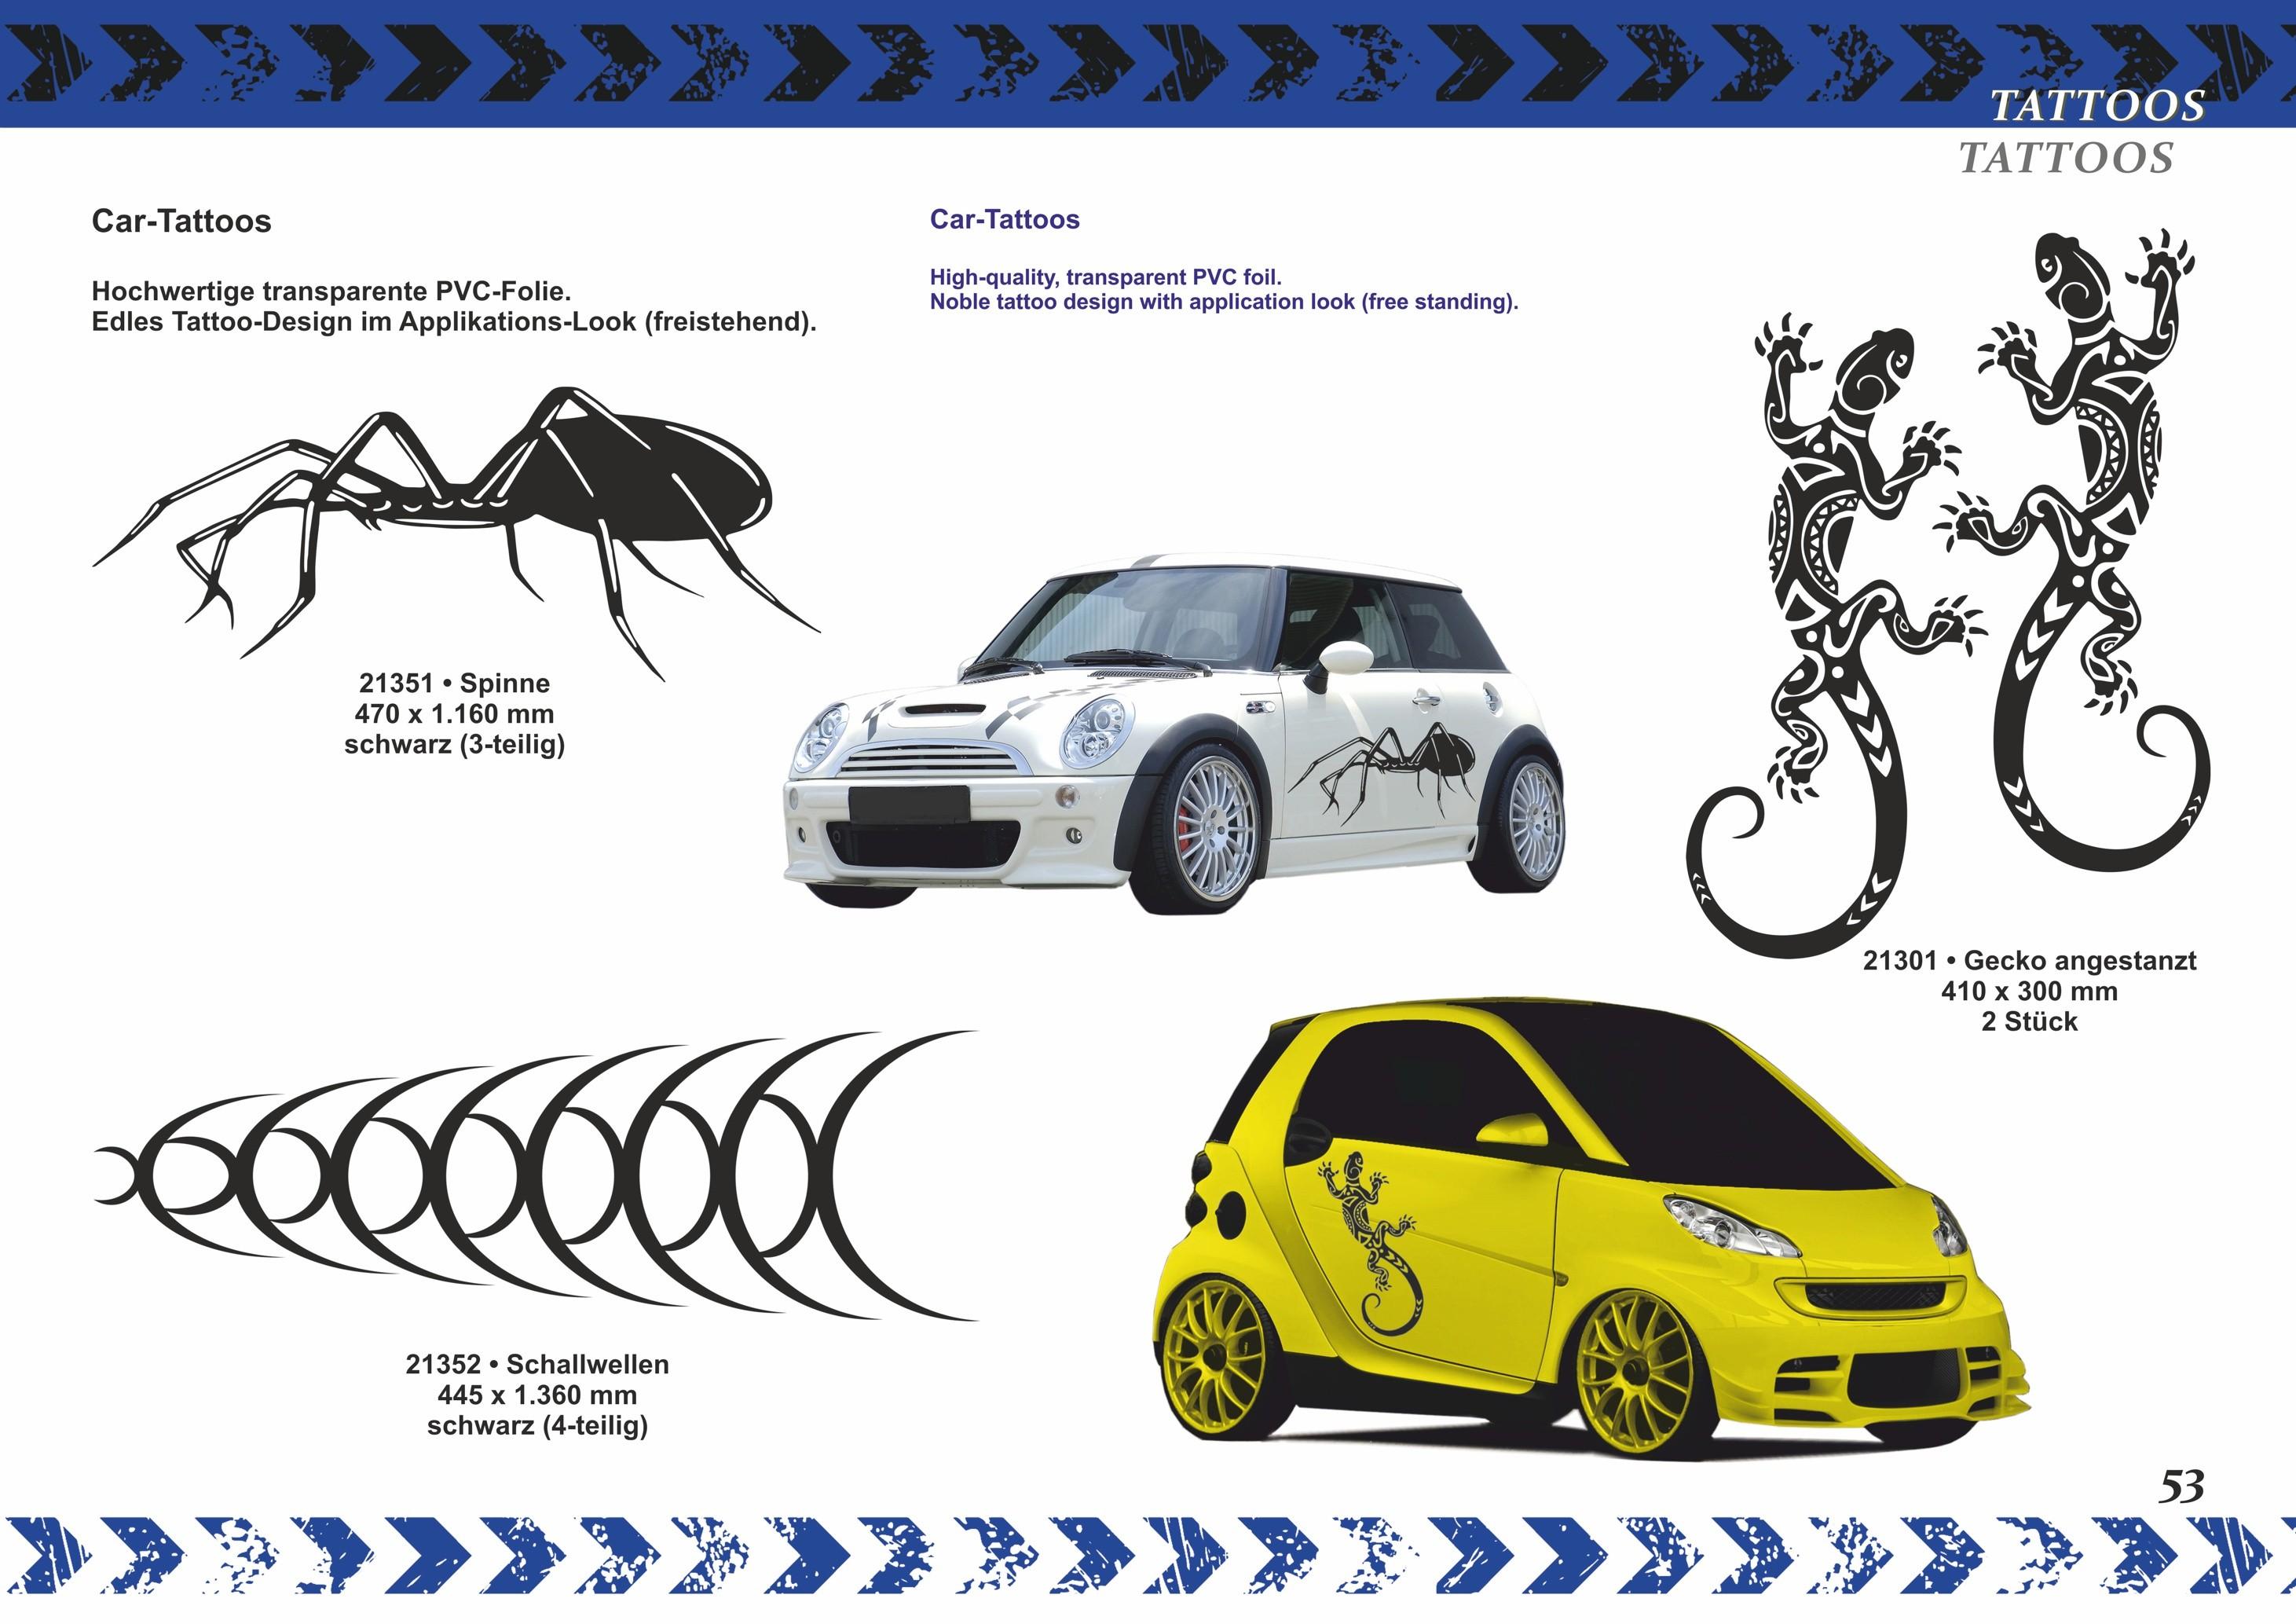 Car-tattoo sound waves 1360 x 425 mm silver – Bild 5